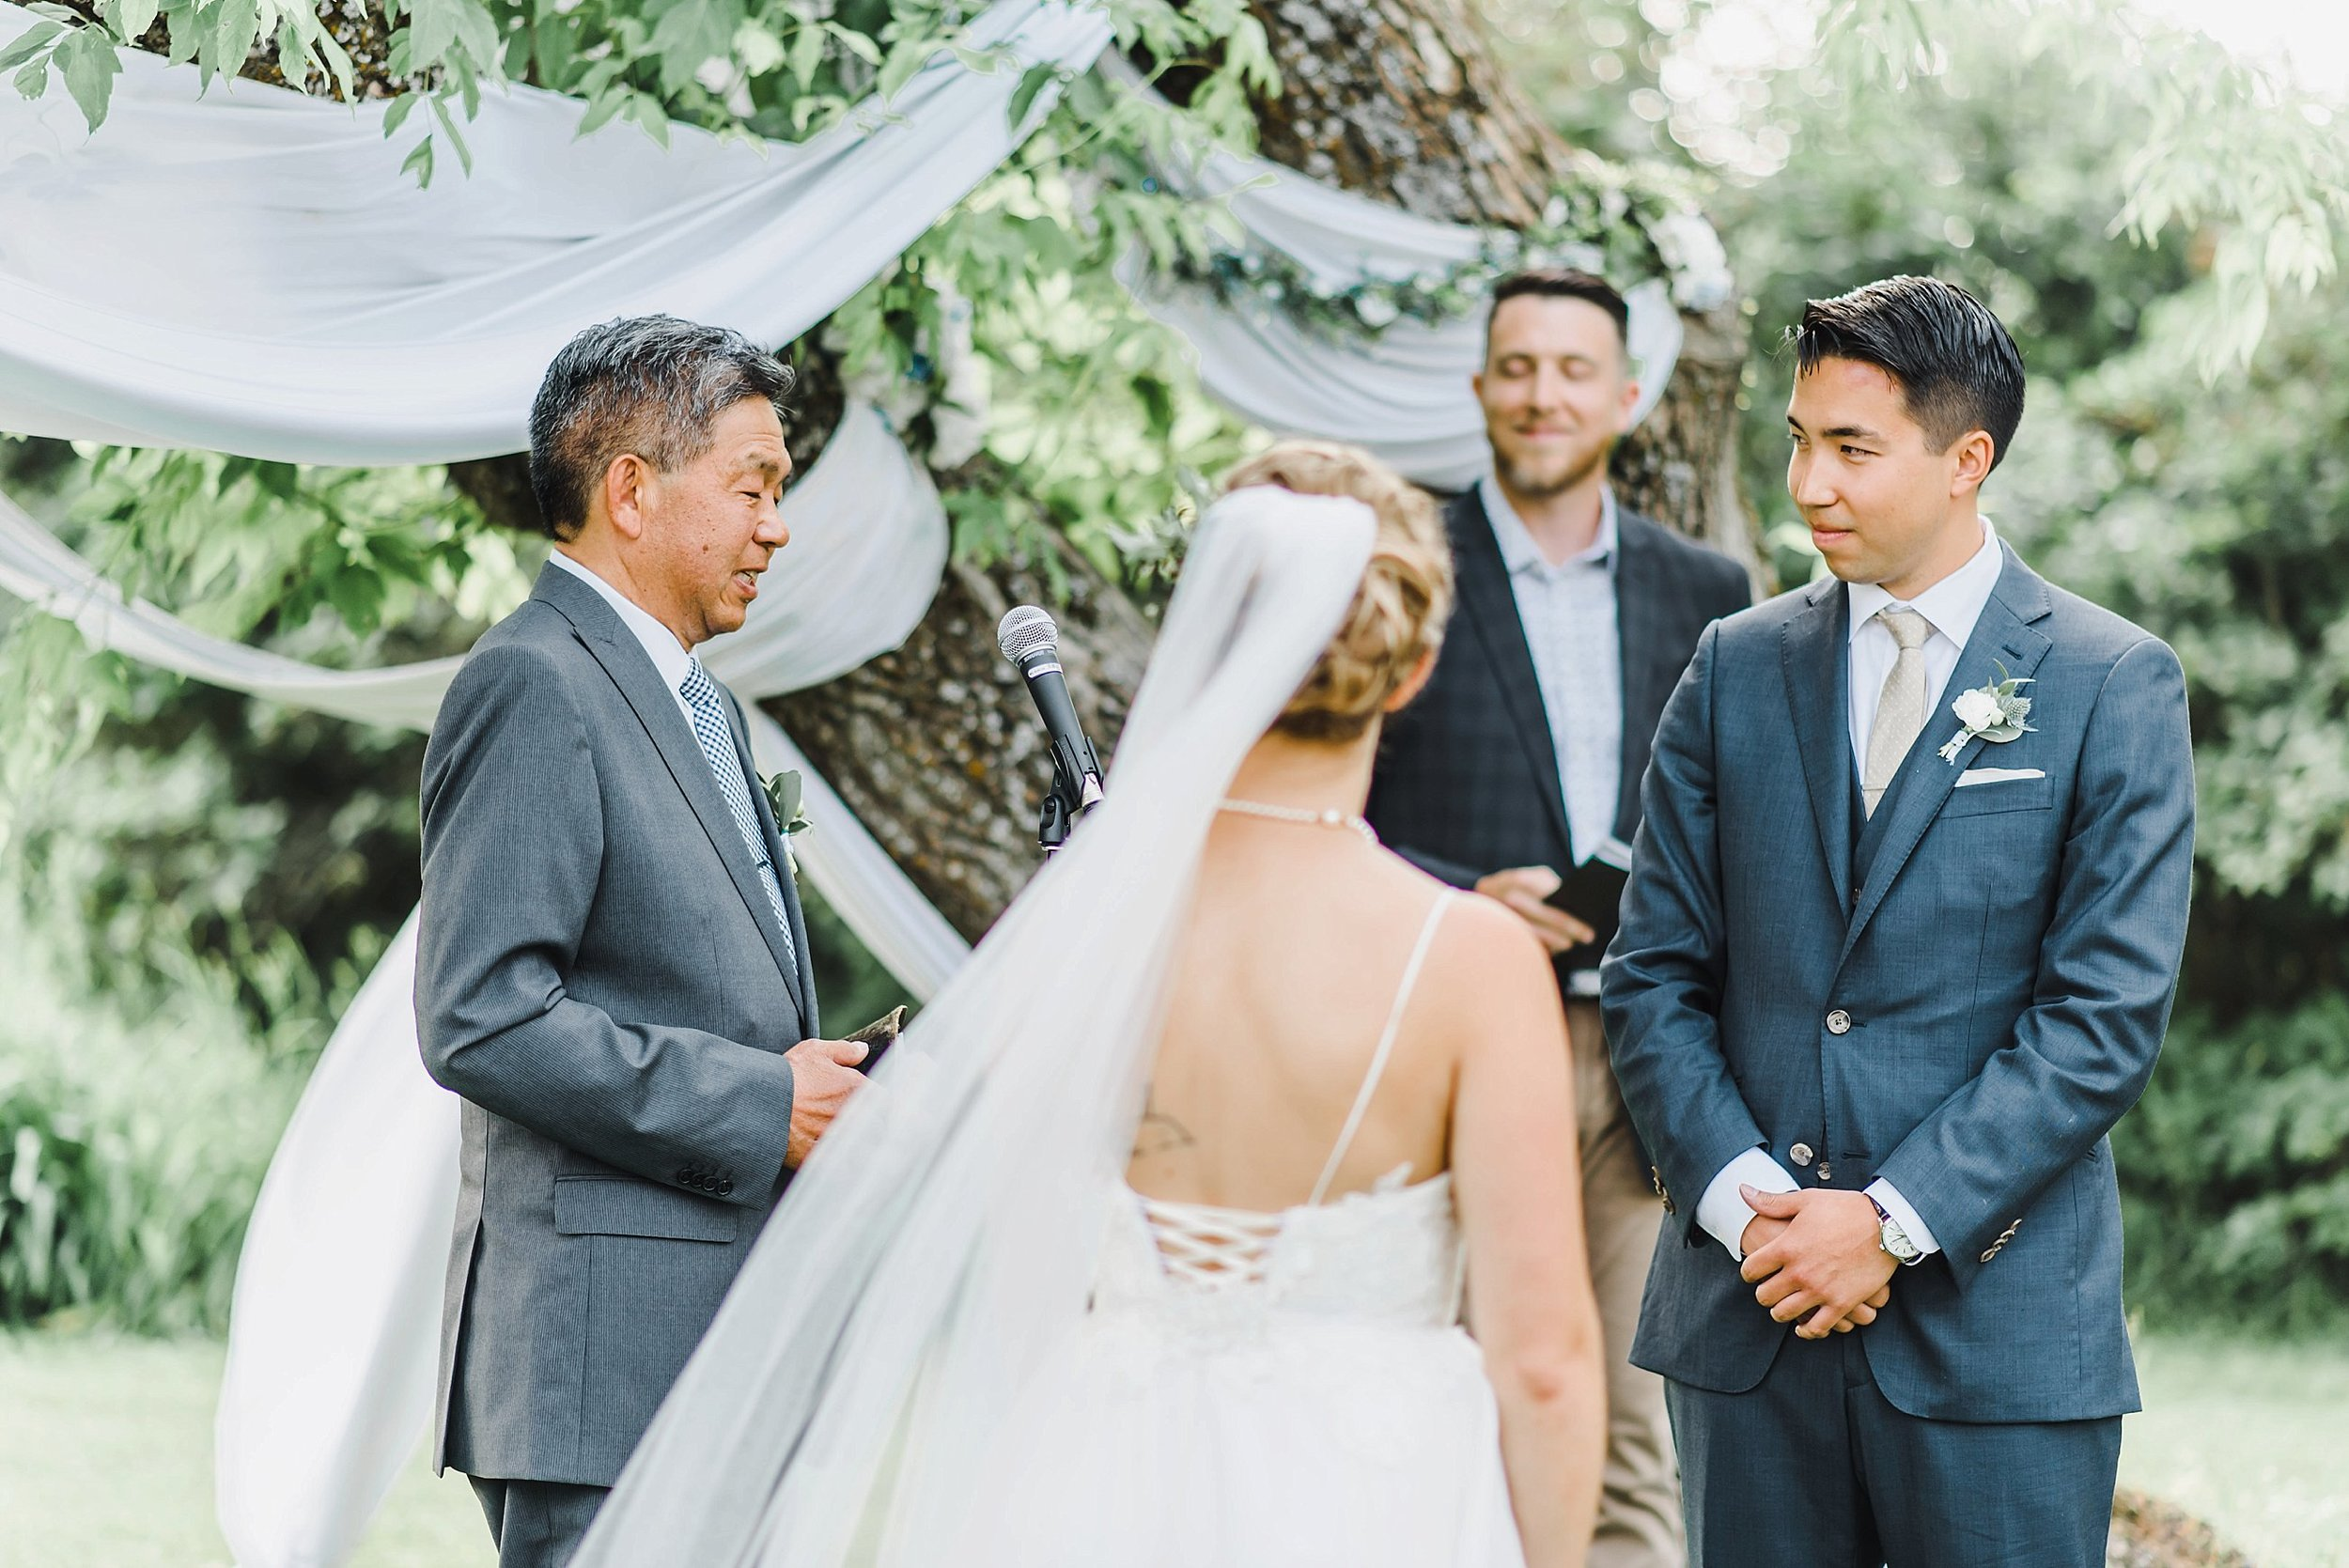 light airy indie fine art ottawa wedding photographer | Ali and Batoul Photography_0812.jpg